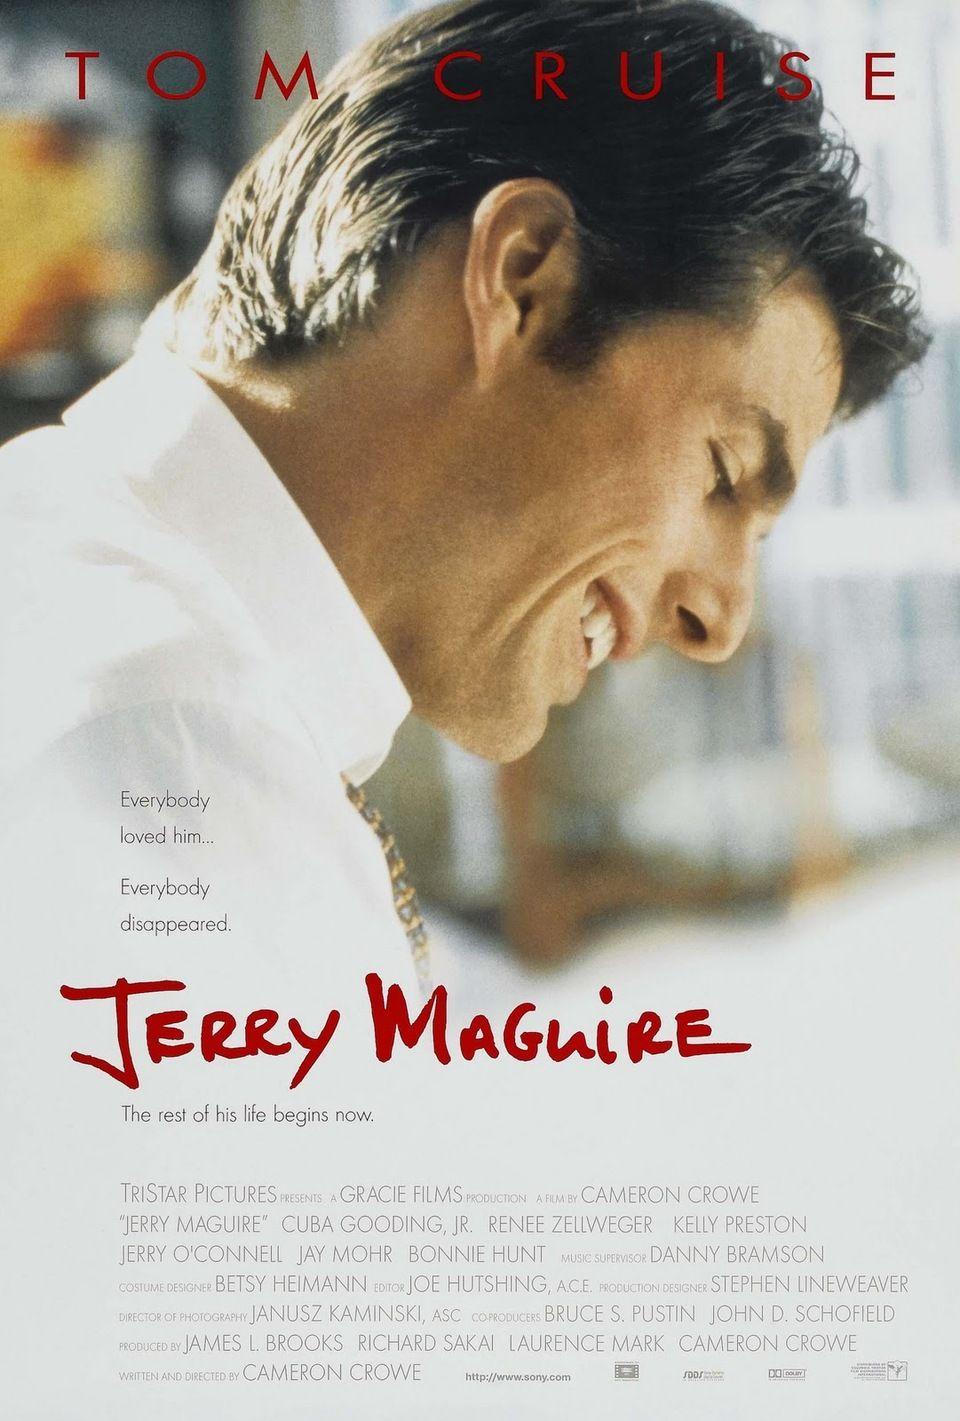 #my favorite movie